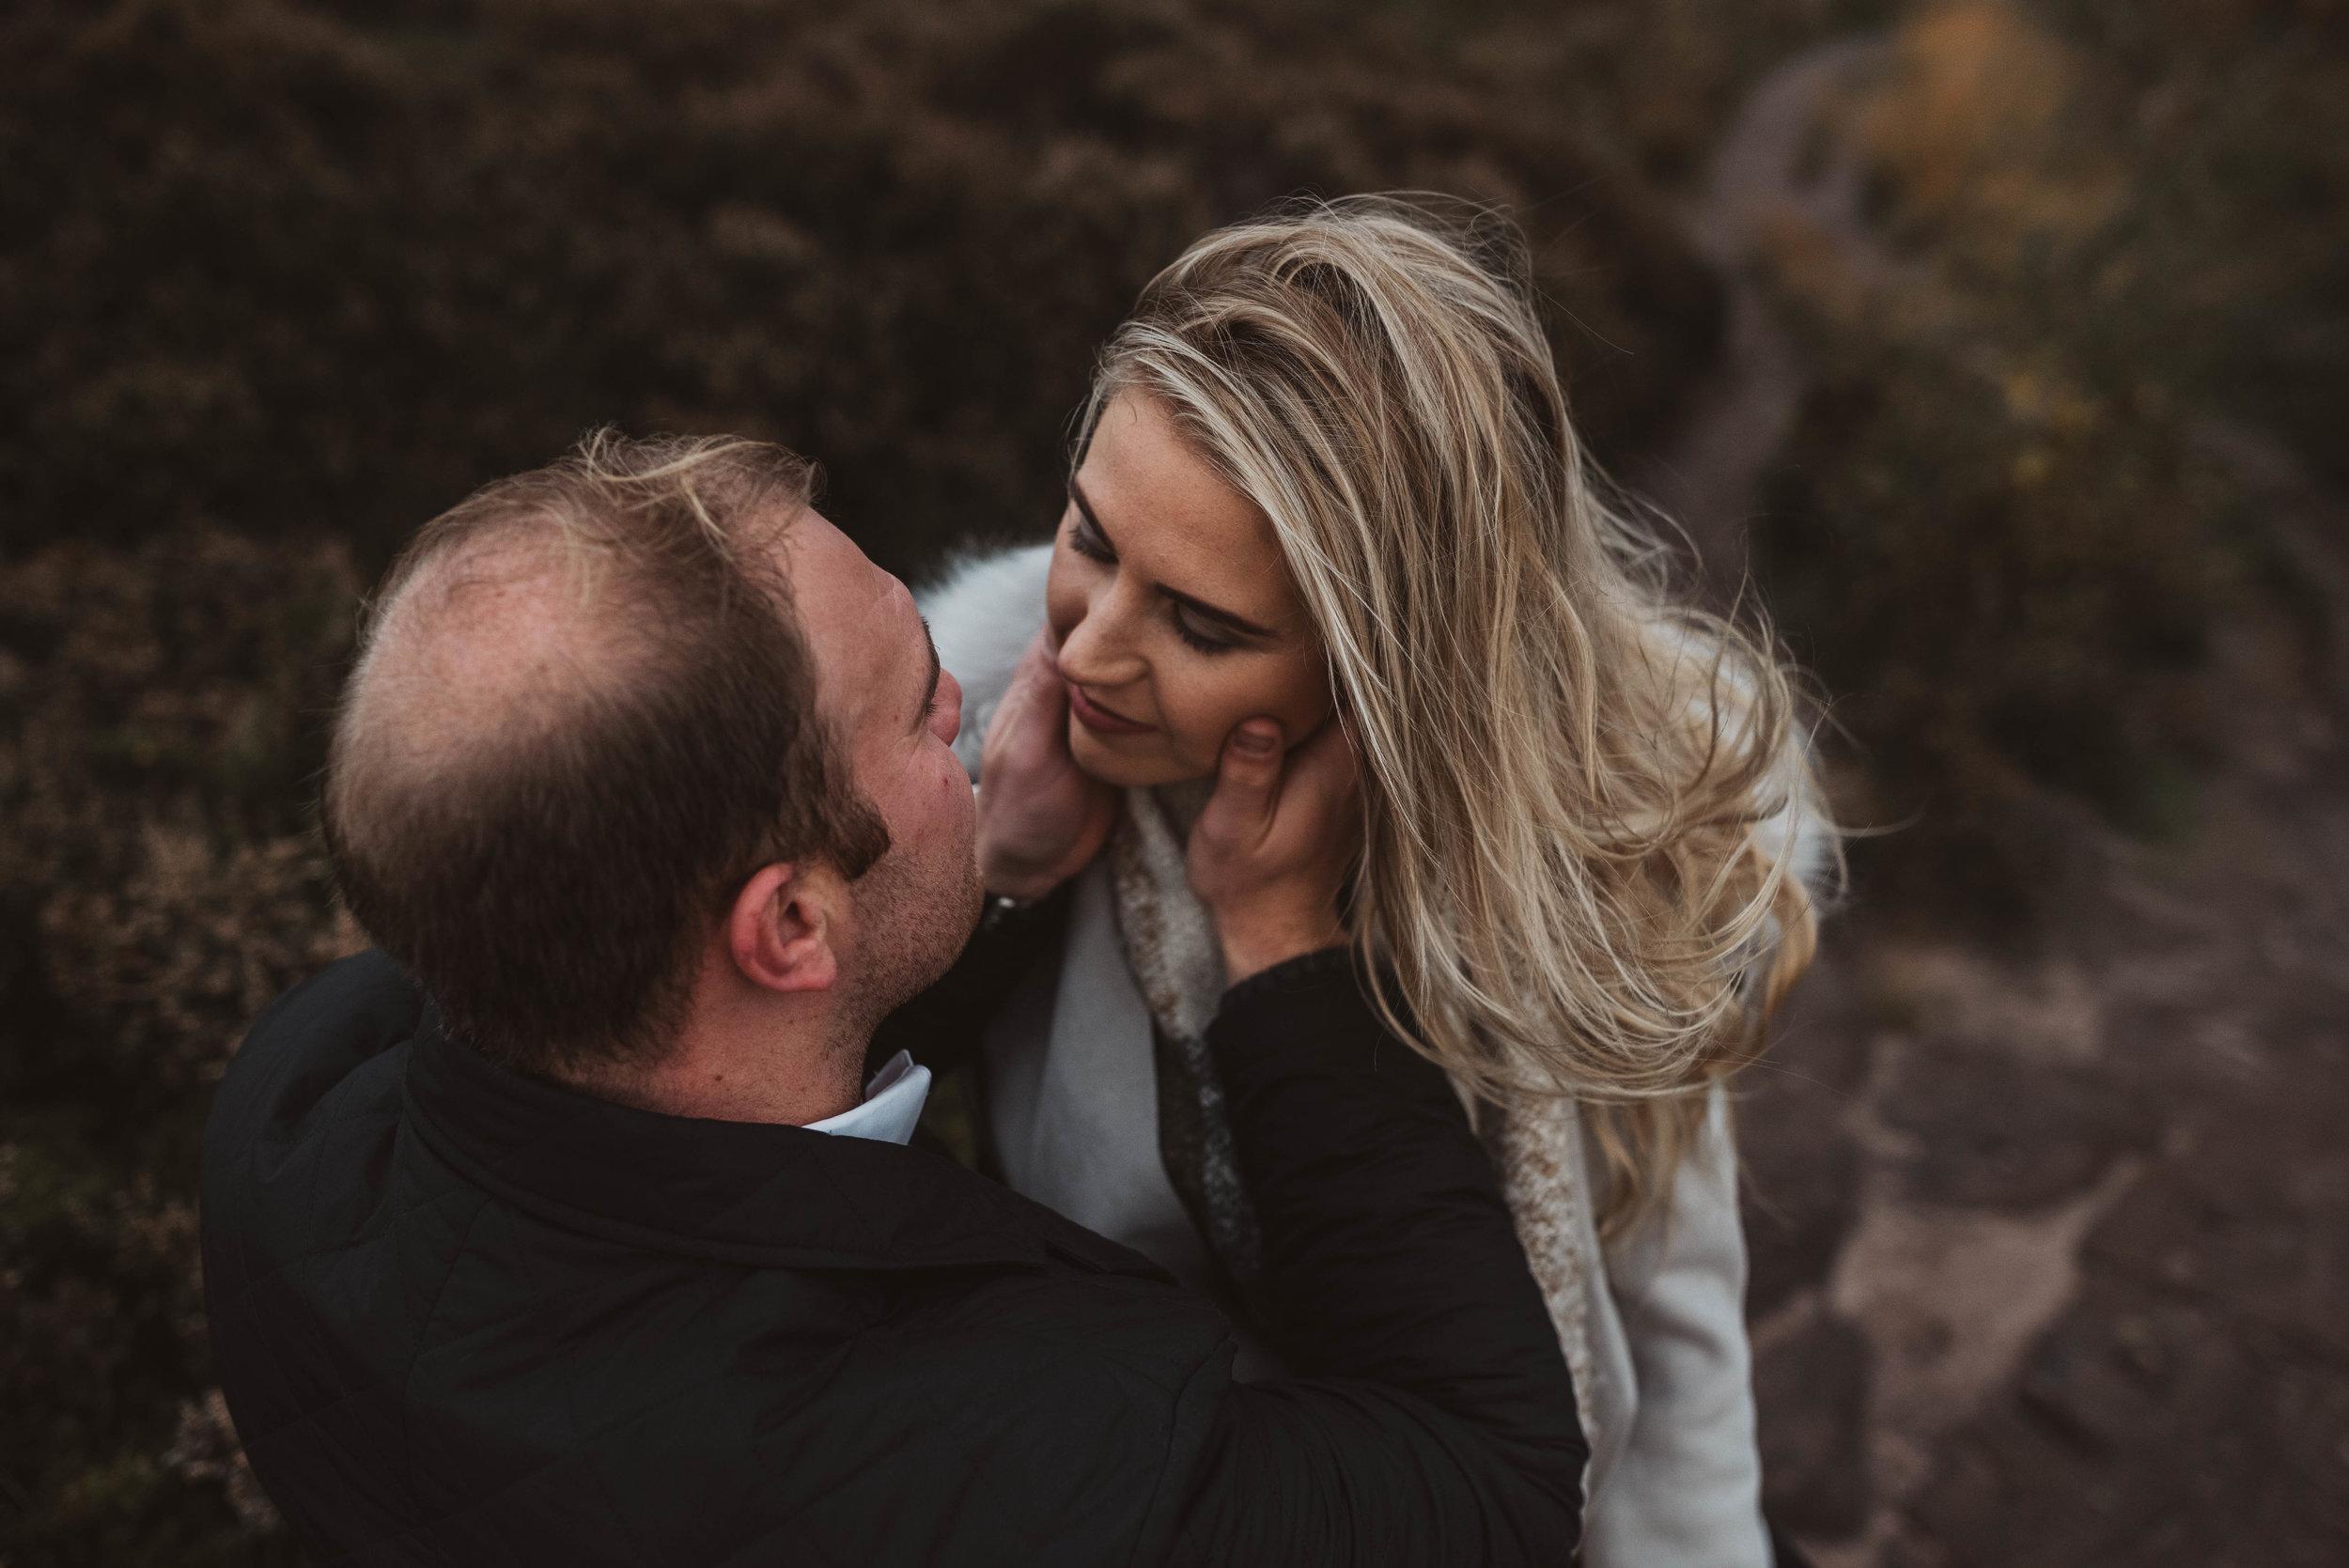 romantic and passionate hug